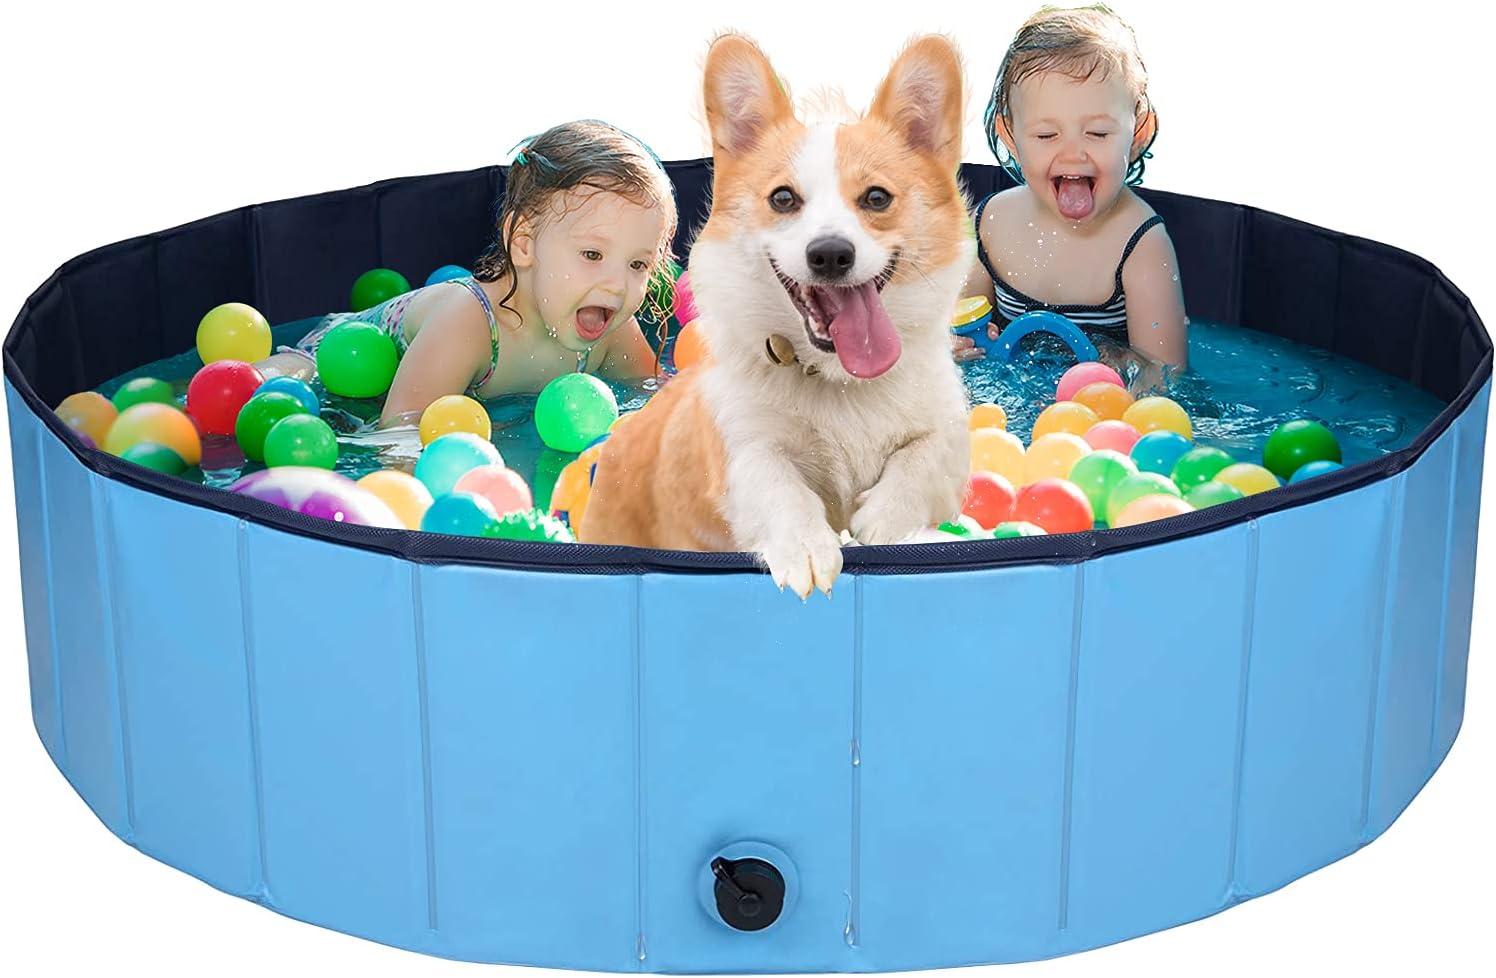 AJKMEI Piscina Perros Grande, Bañeras para Perros, PVC Antideslizante Bañera Plegable para Mascotas, Azul (M:80cmx20cm)